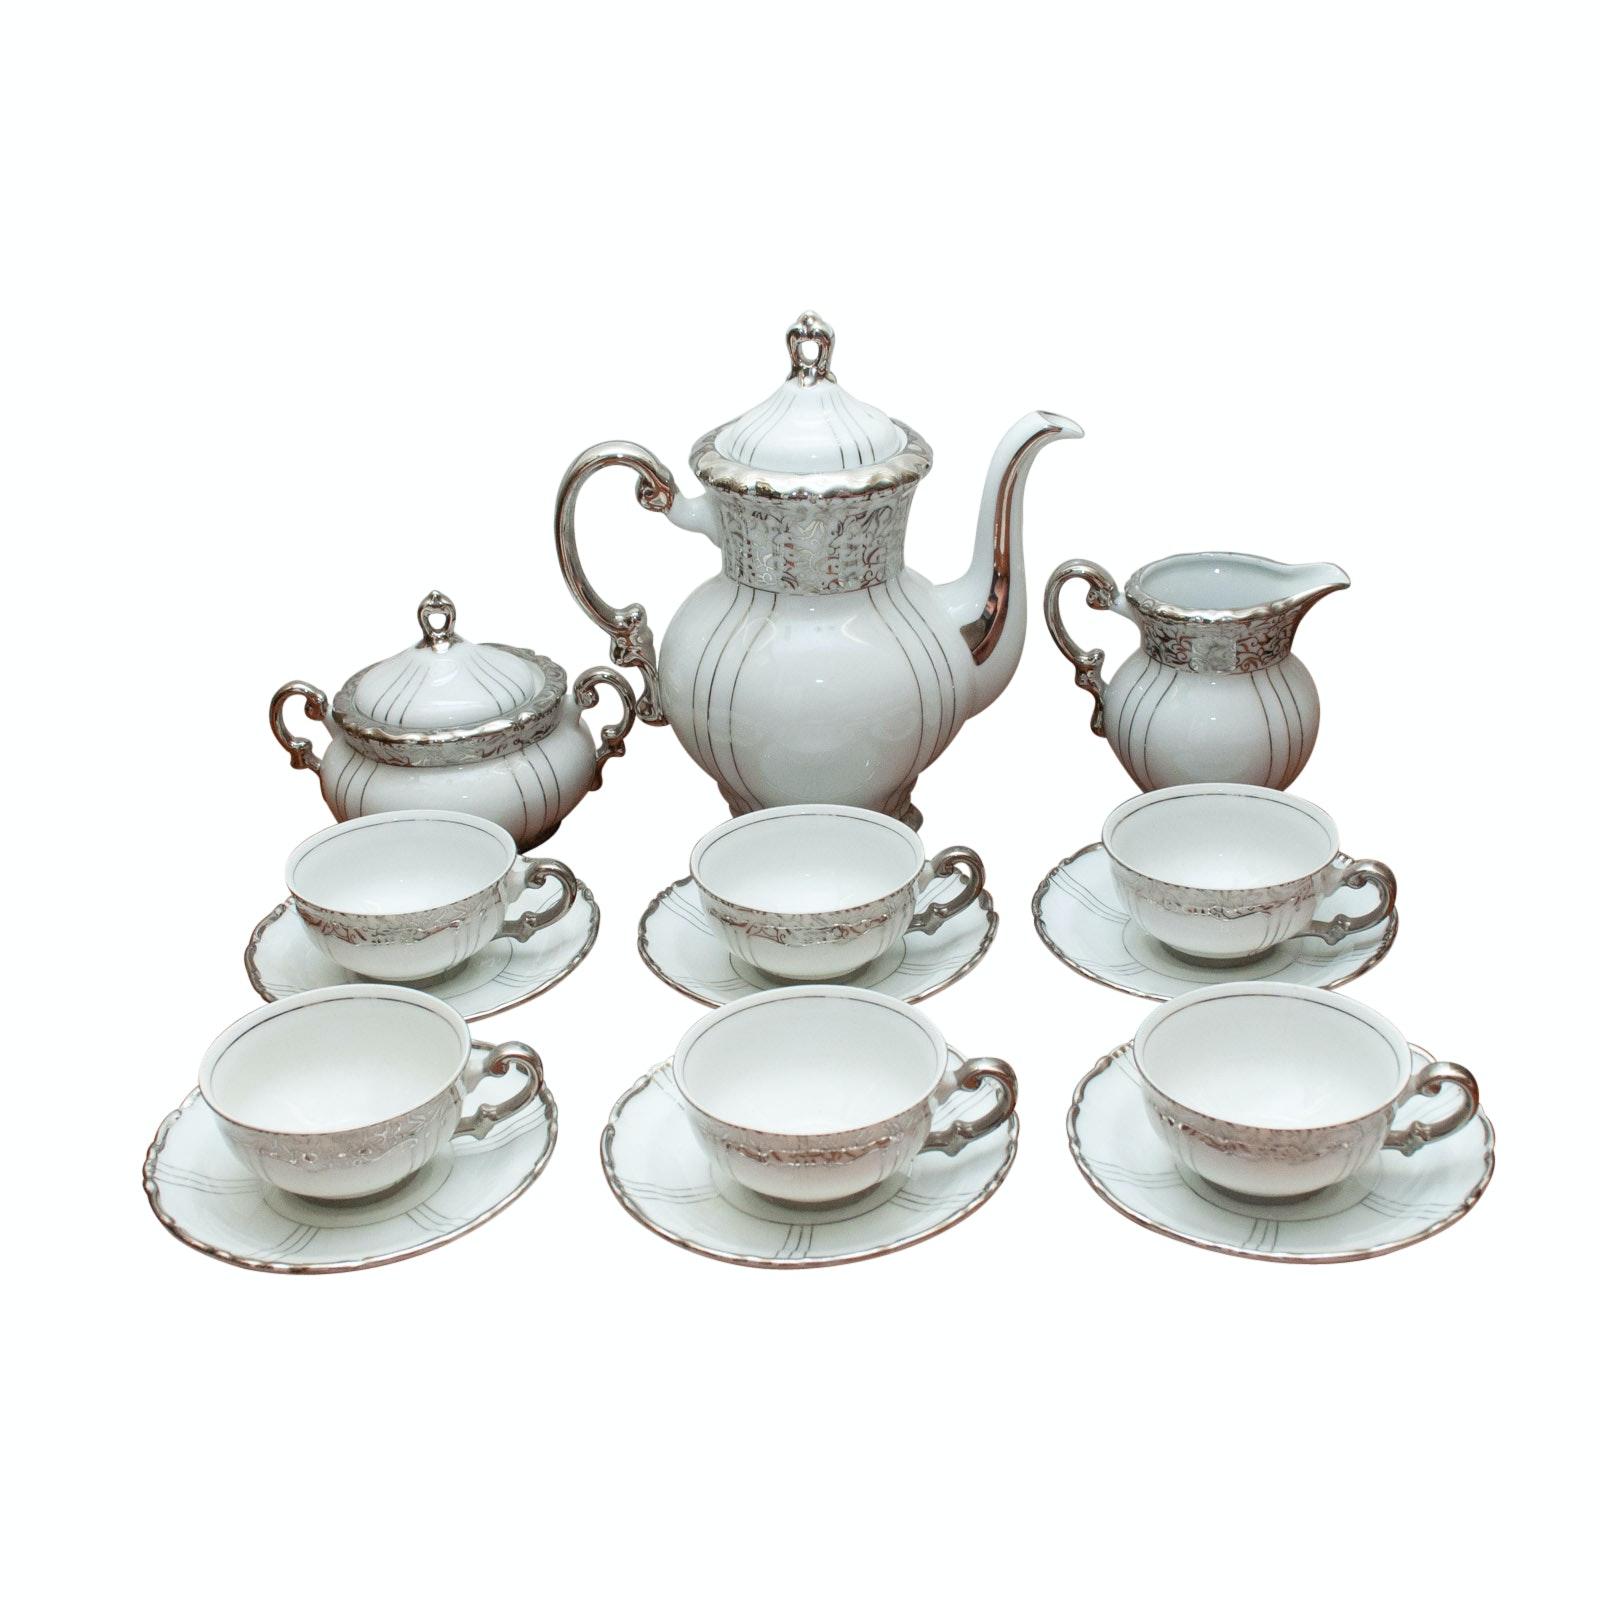 Seyei China Porcelain Tea Set